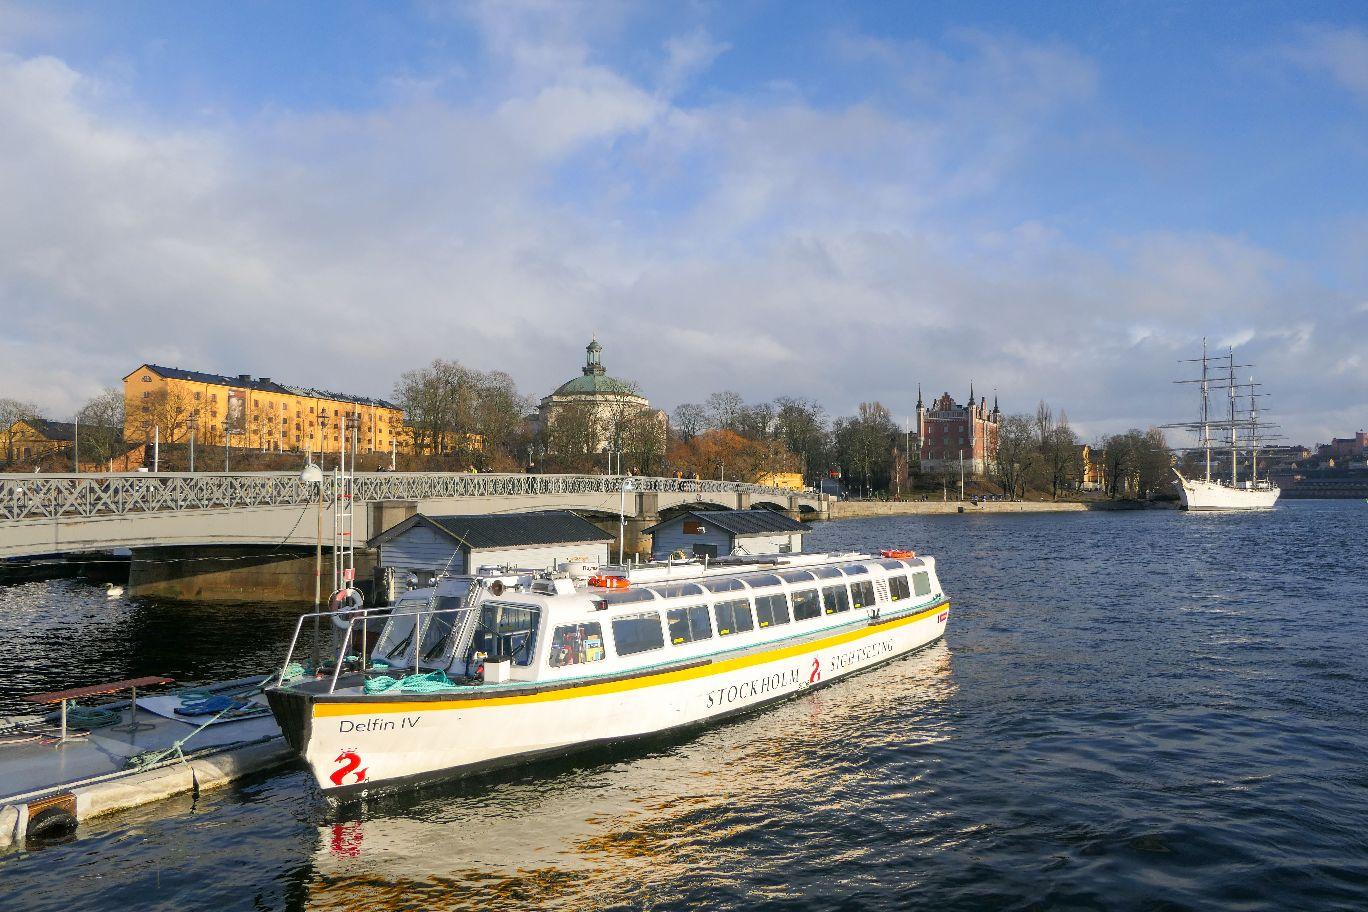 Stockholm Schweden Södra Blasieholmshamnen Skeppsholmsbronn